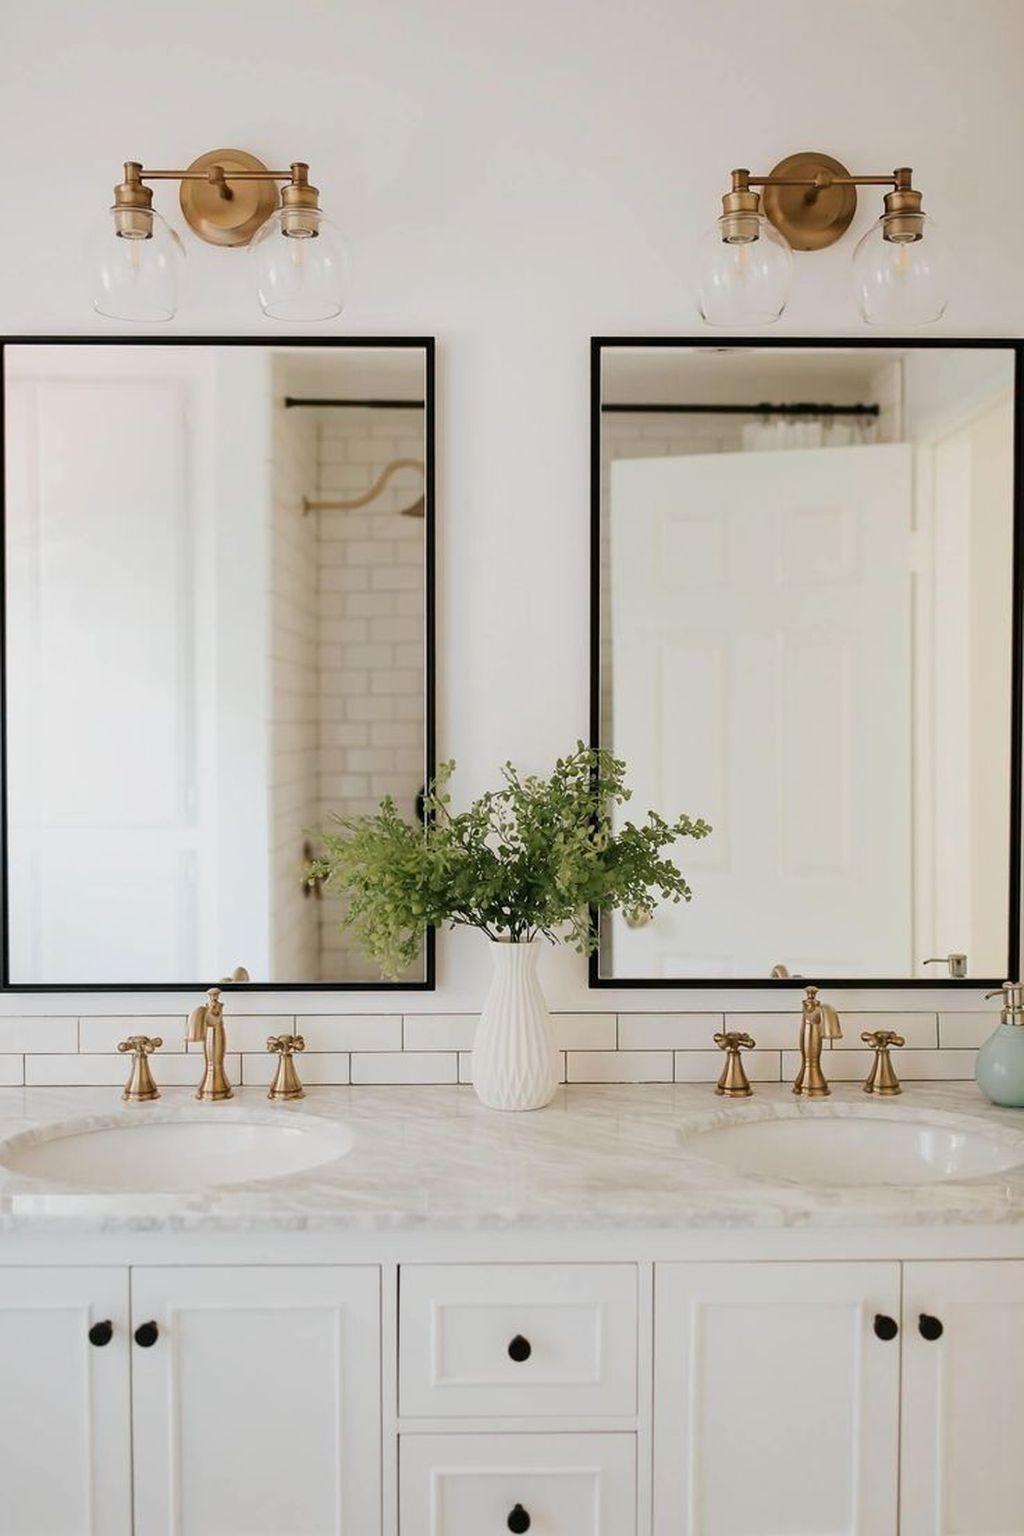 Admirable Rustic Modern Bathroom Design And Decor Ideas 06